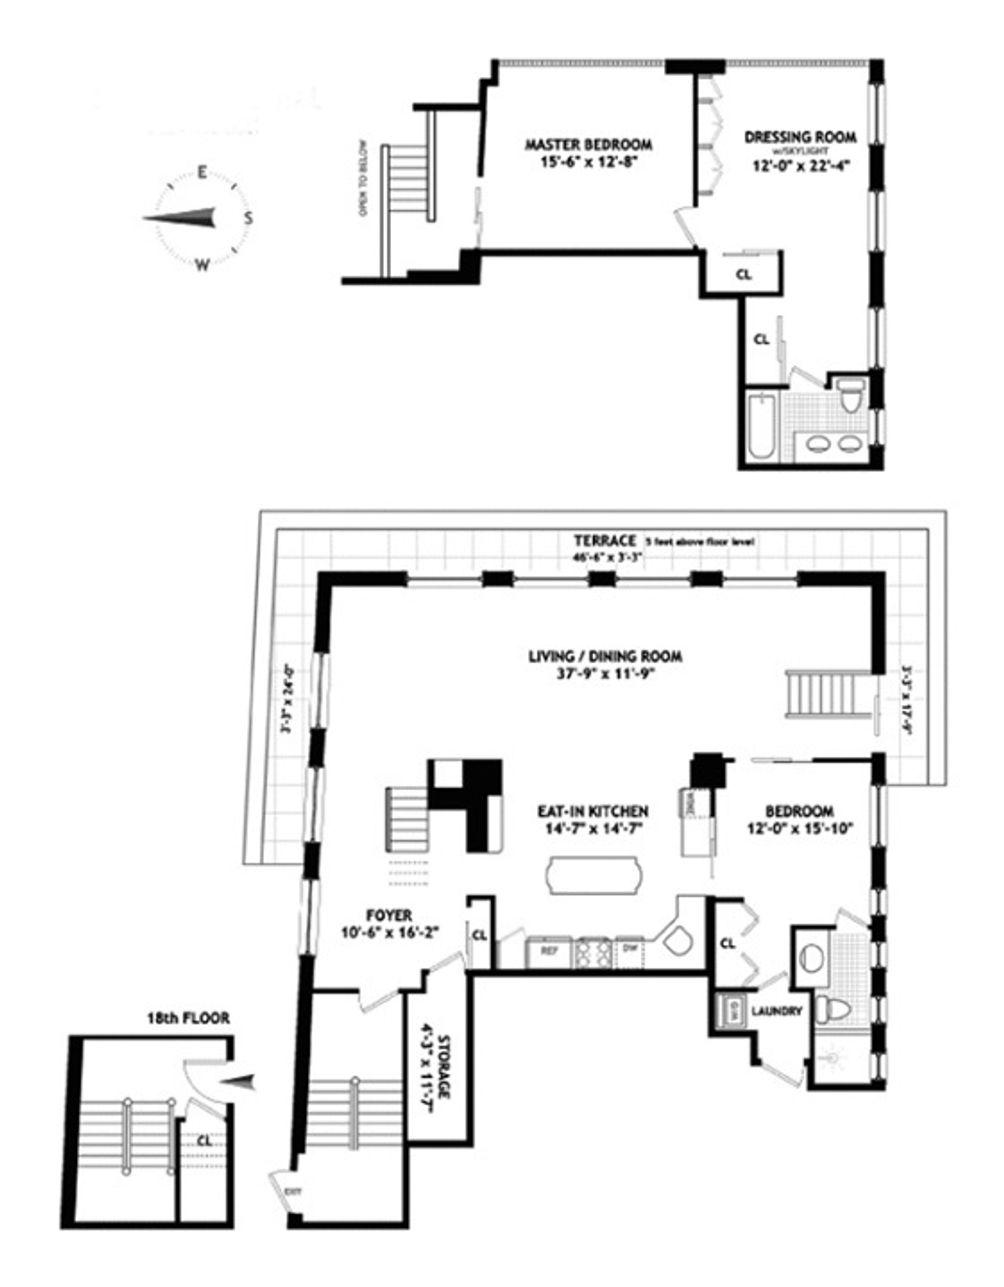 26 Beaver Street #PH floor plan